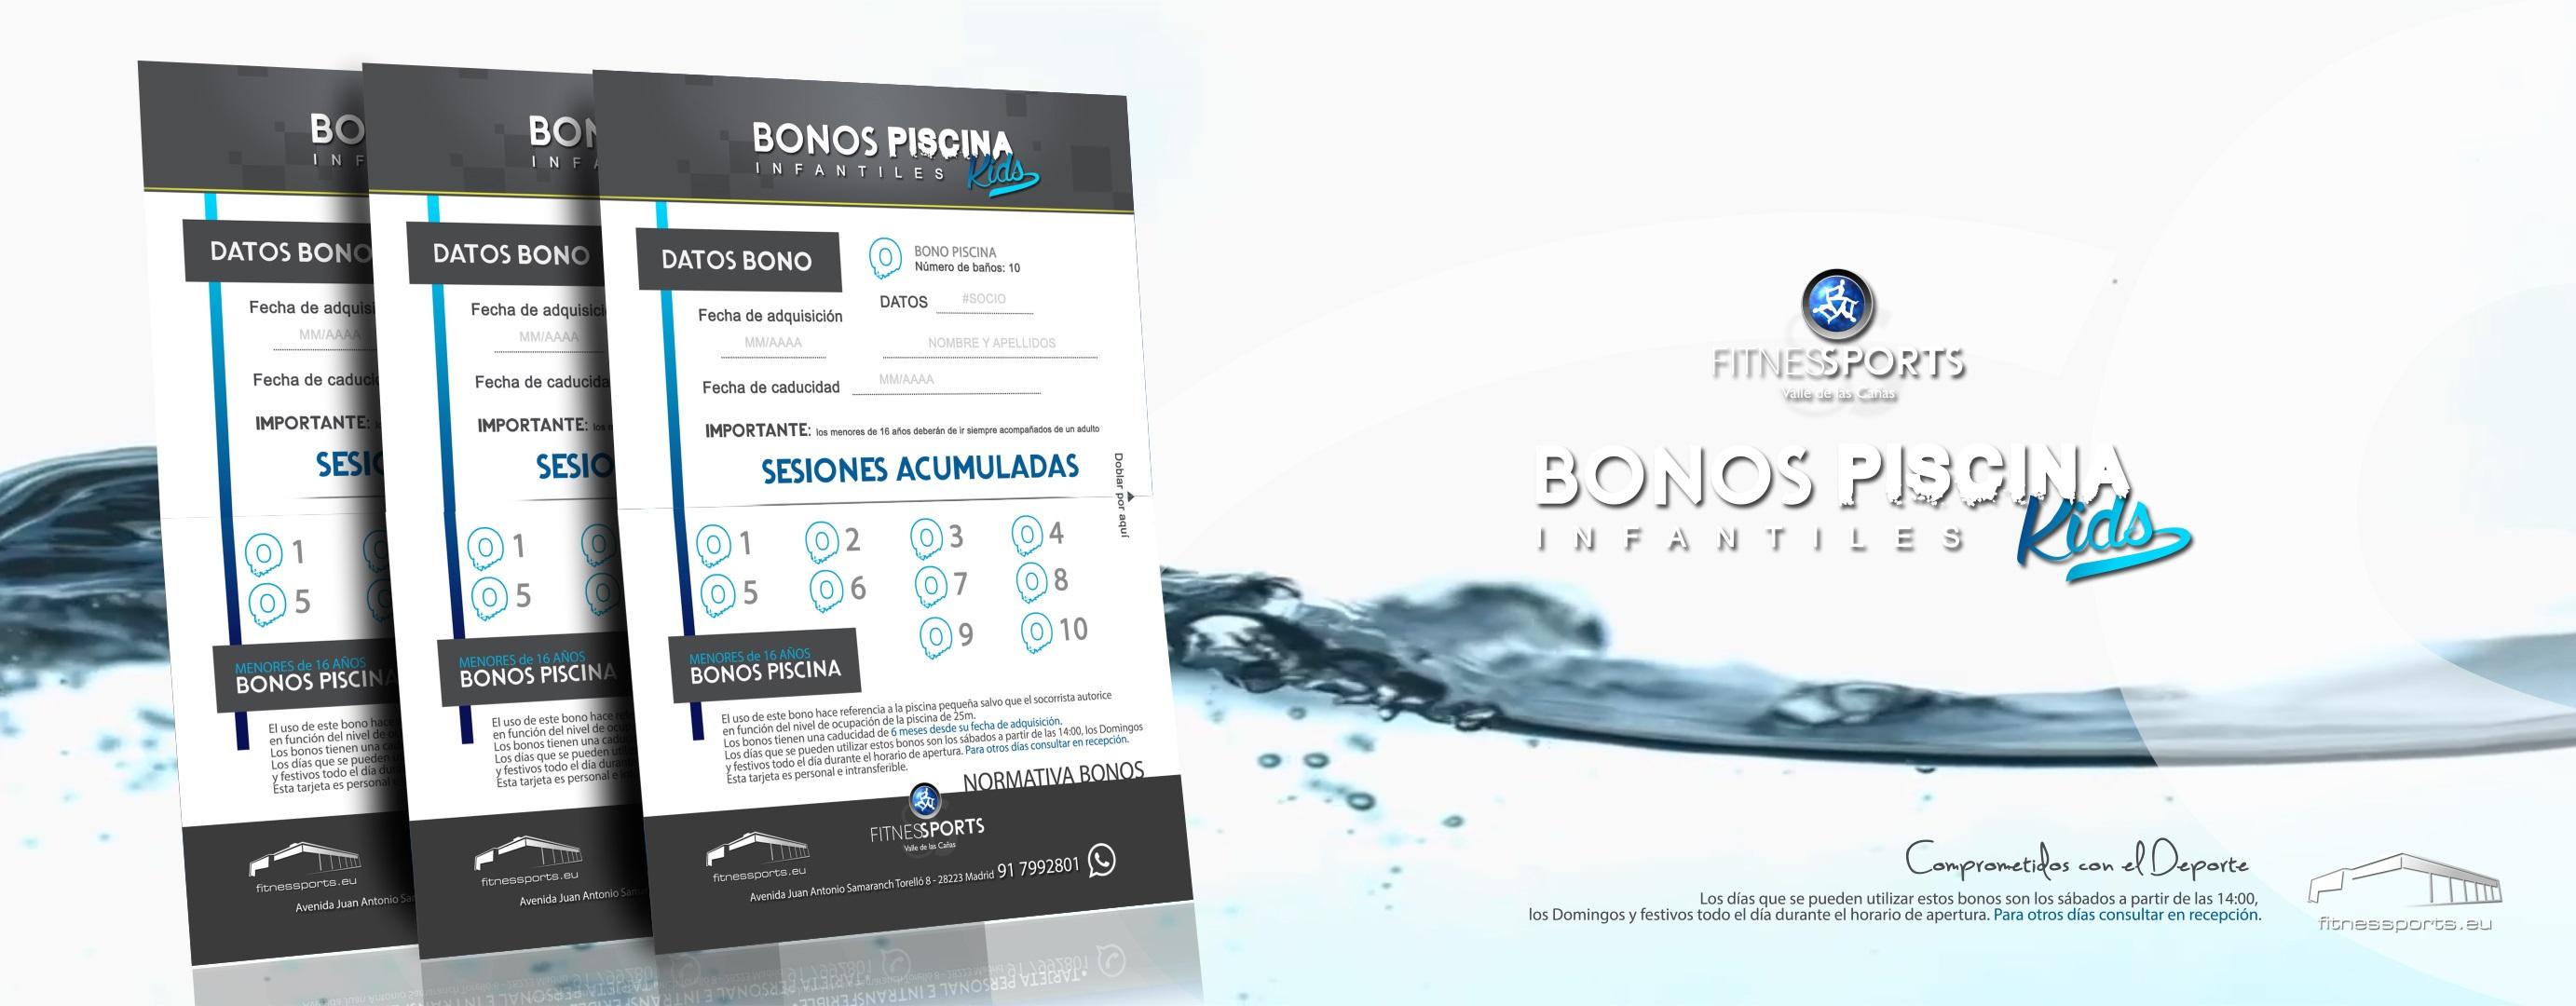 https://perfectpixel.es/wp-content/uploads/2017/04/Bonos-de-piscina-para-ni%C3%B1os-Fitness-Sports-Valle-de-las-Ca%C3%B1as-de-0-a-16-a%C3%B1os-Perfect-Pixel-Publicidad-1.jpg